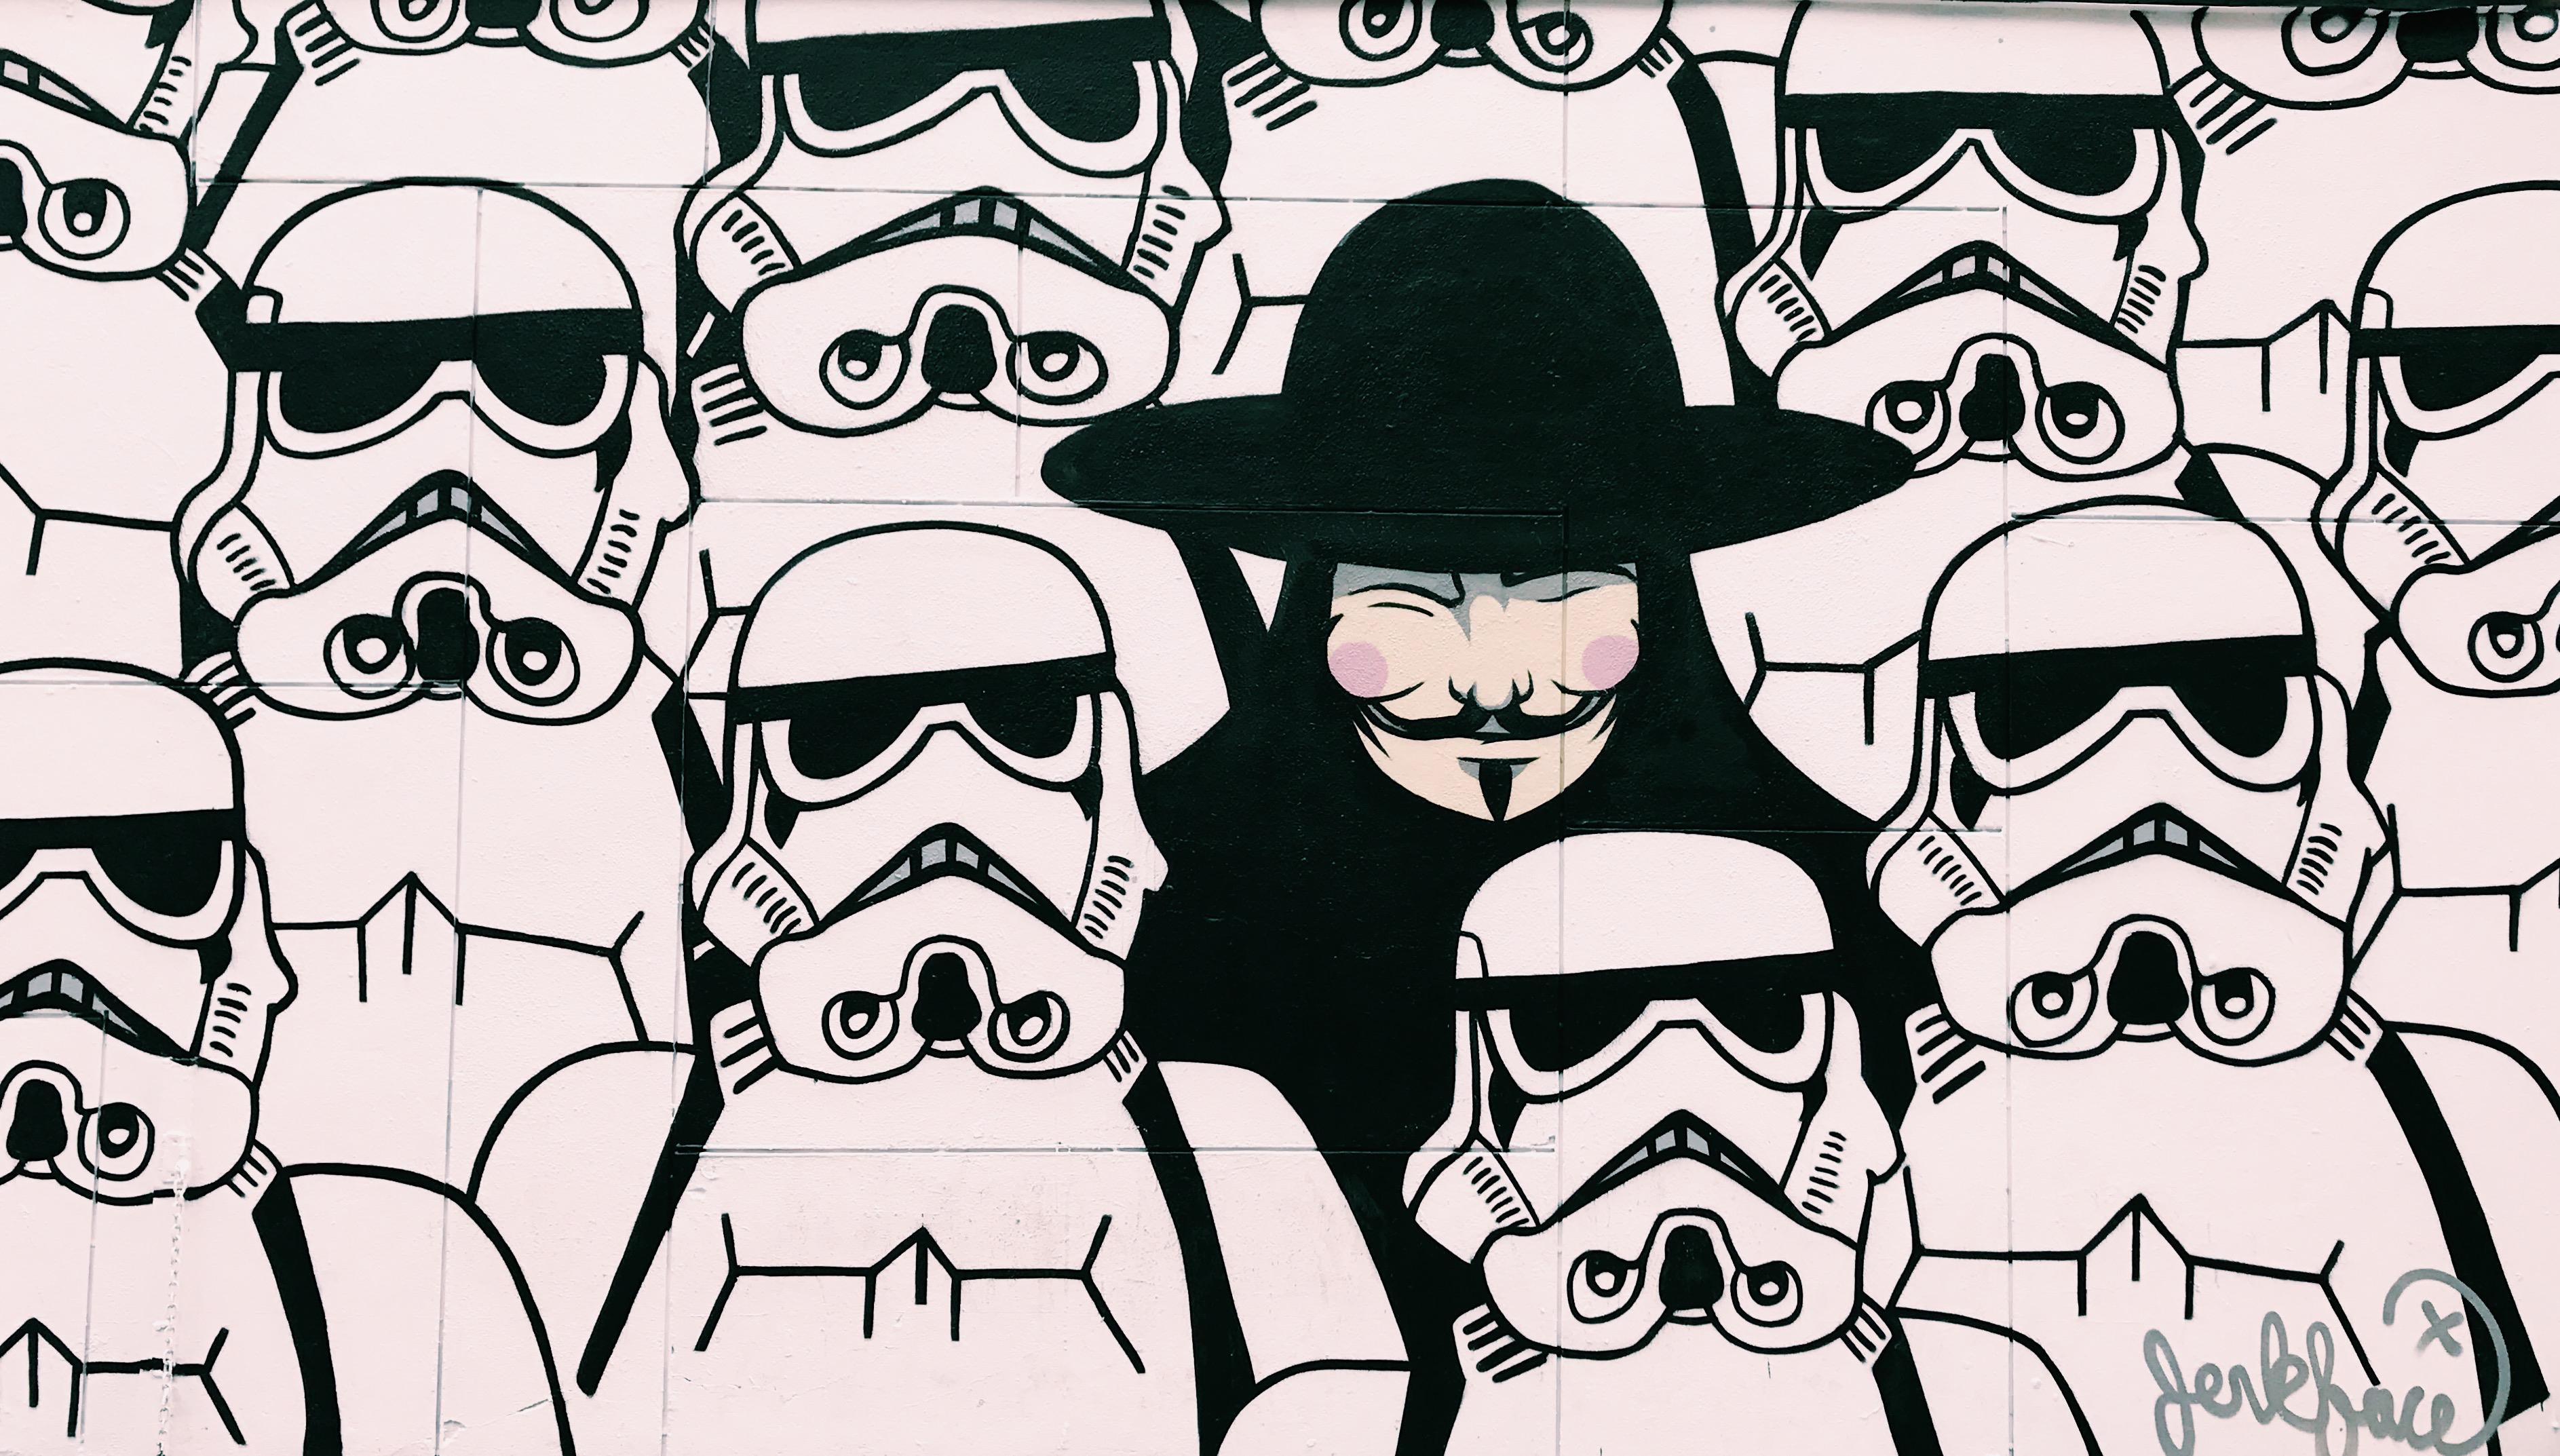 Gambar  Kartun Polisi Nembak Wallpaper